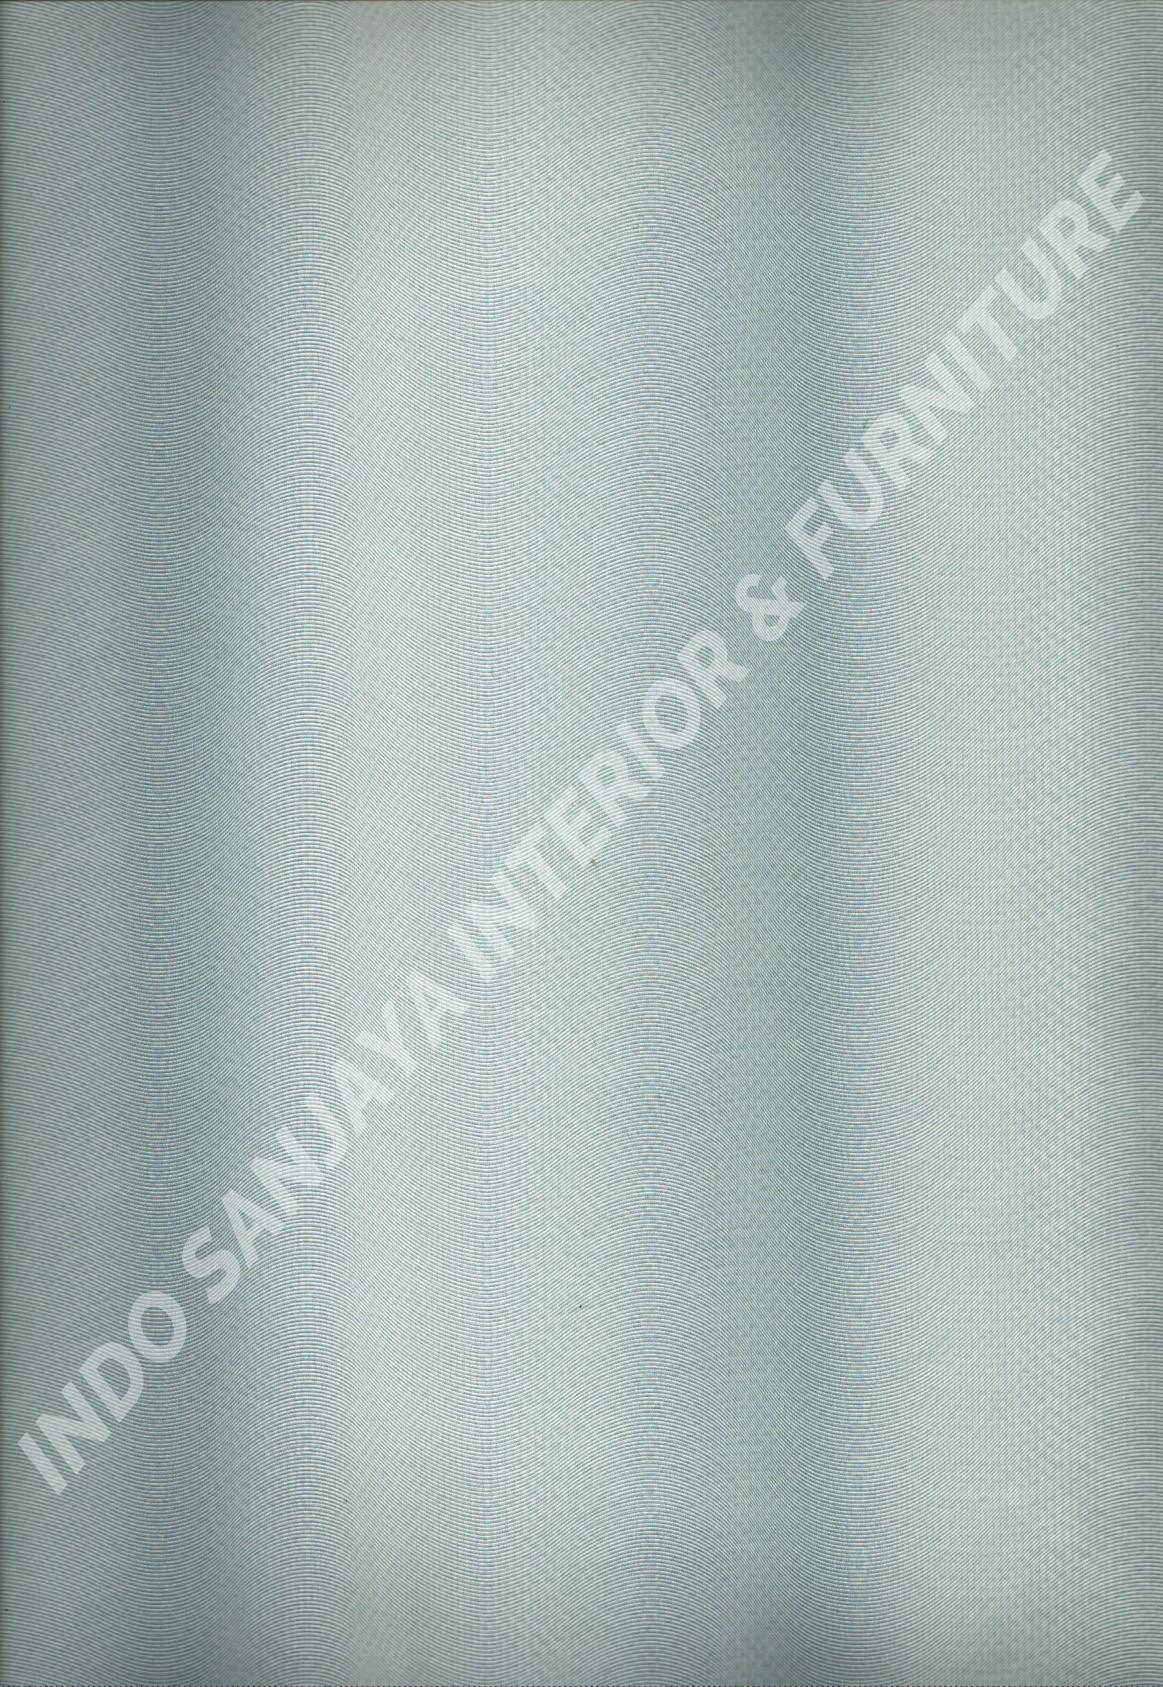 wallpaper   Wallpaper Minimalis Polos 2571-4:2571-4 corak  warna